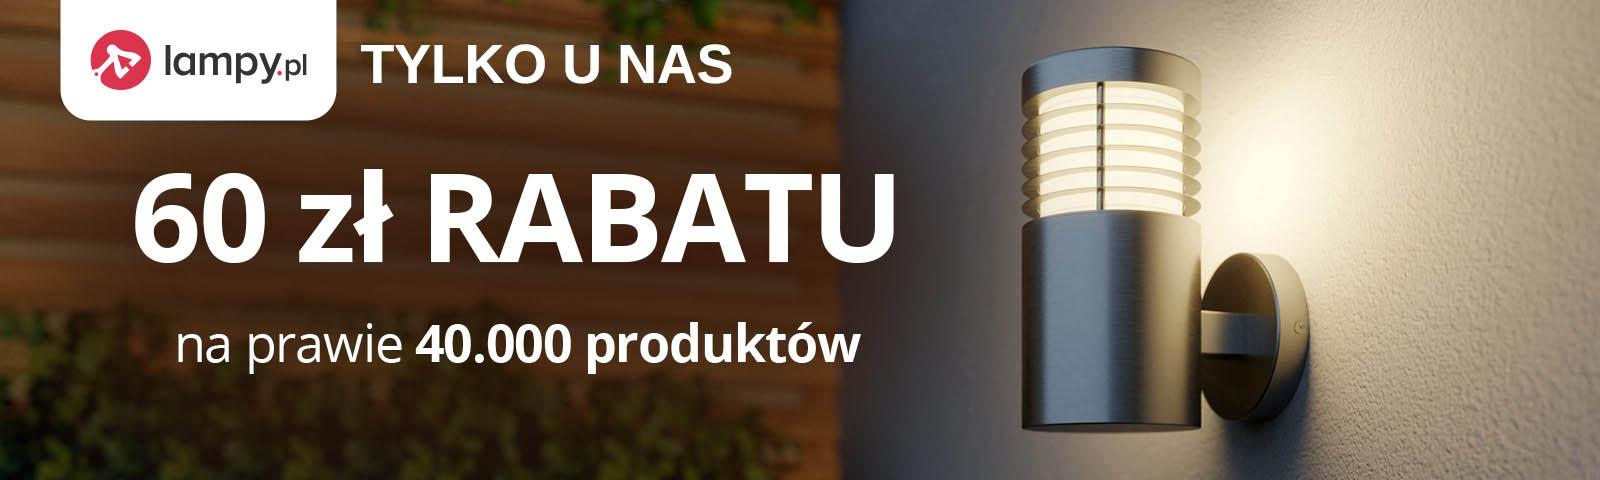 Lampy.pl kody rabatowe